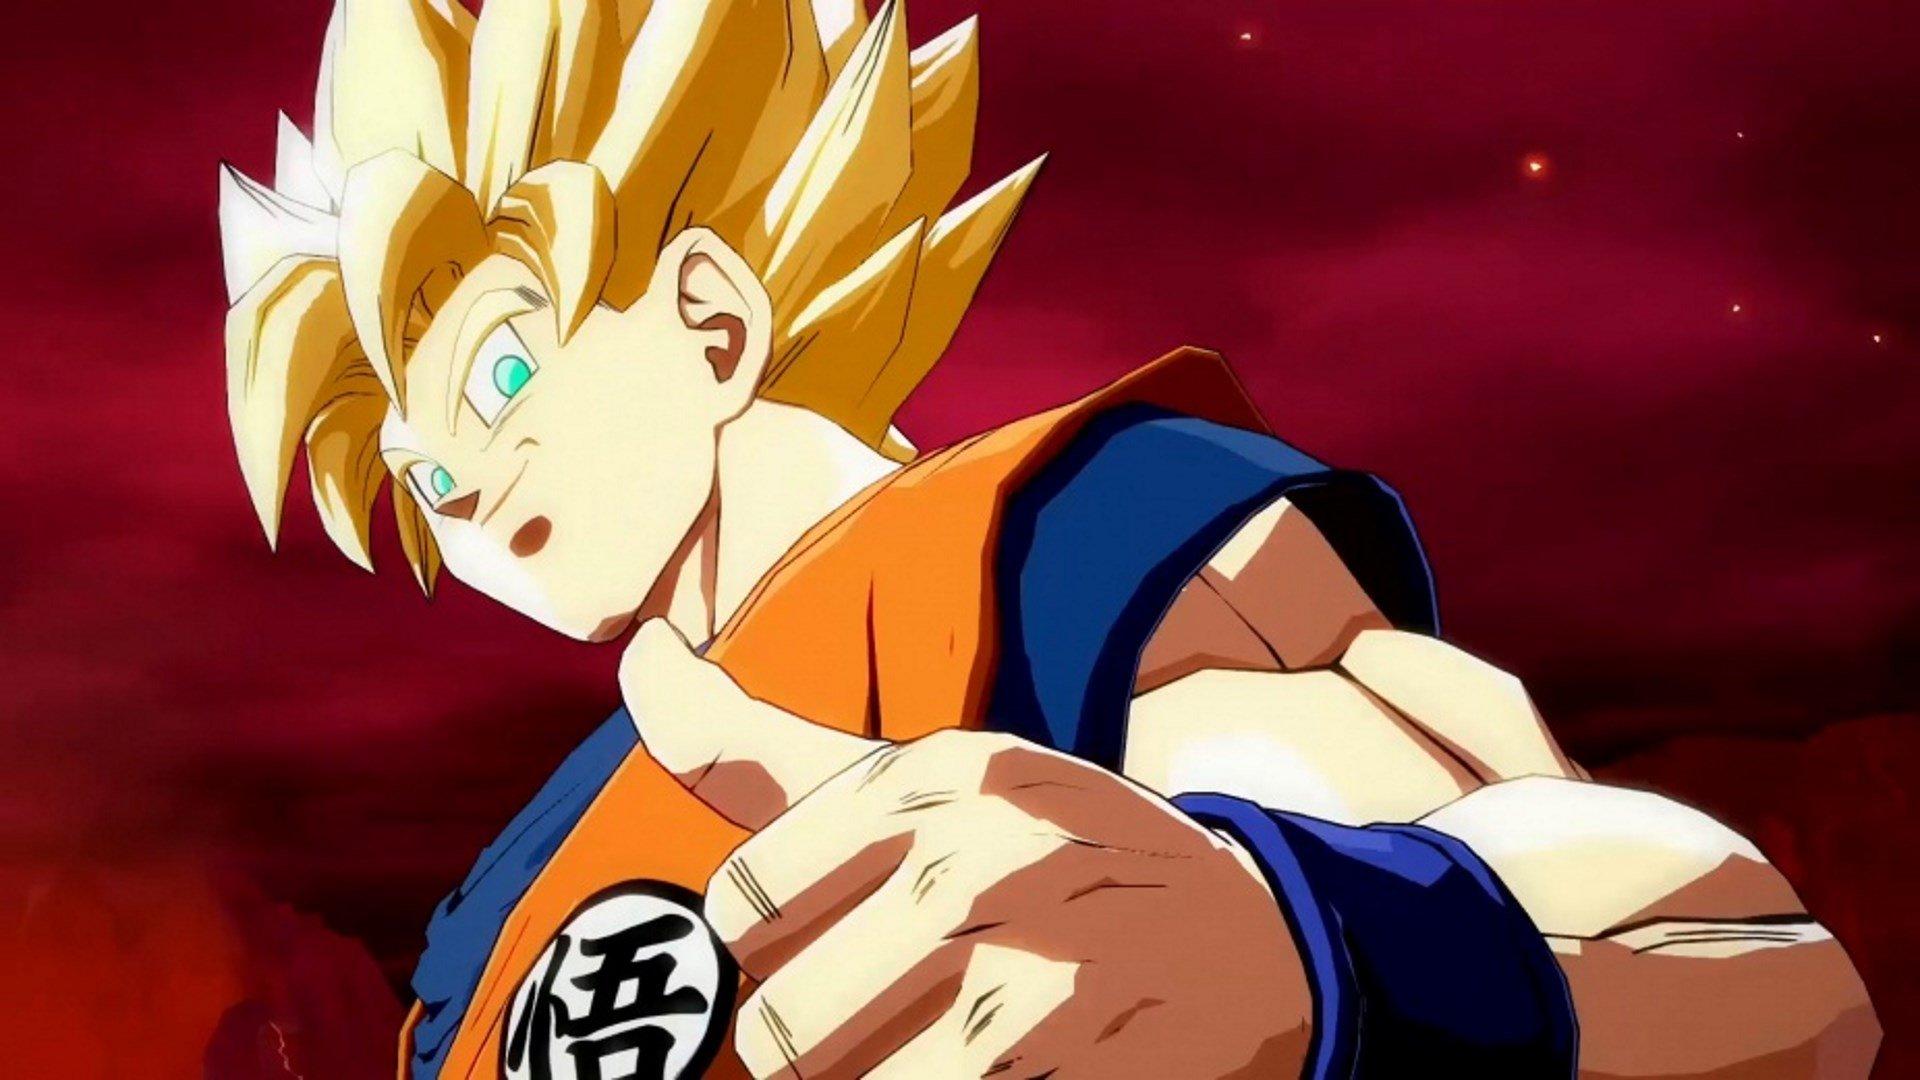 Goku Super Smash Bros Ultimate fighters